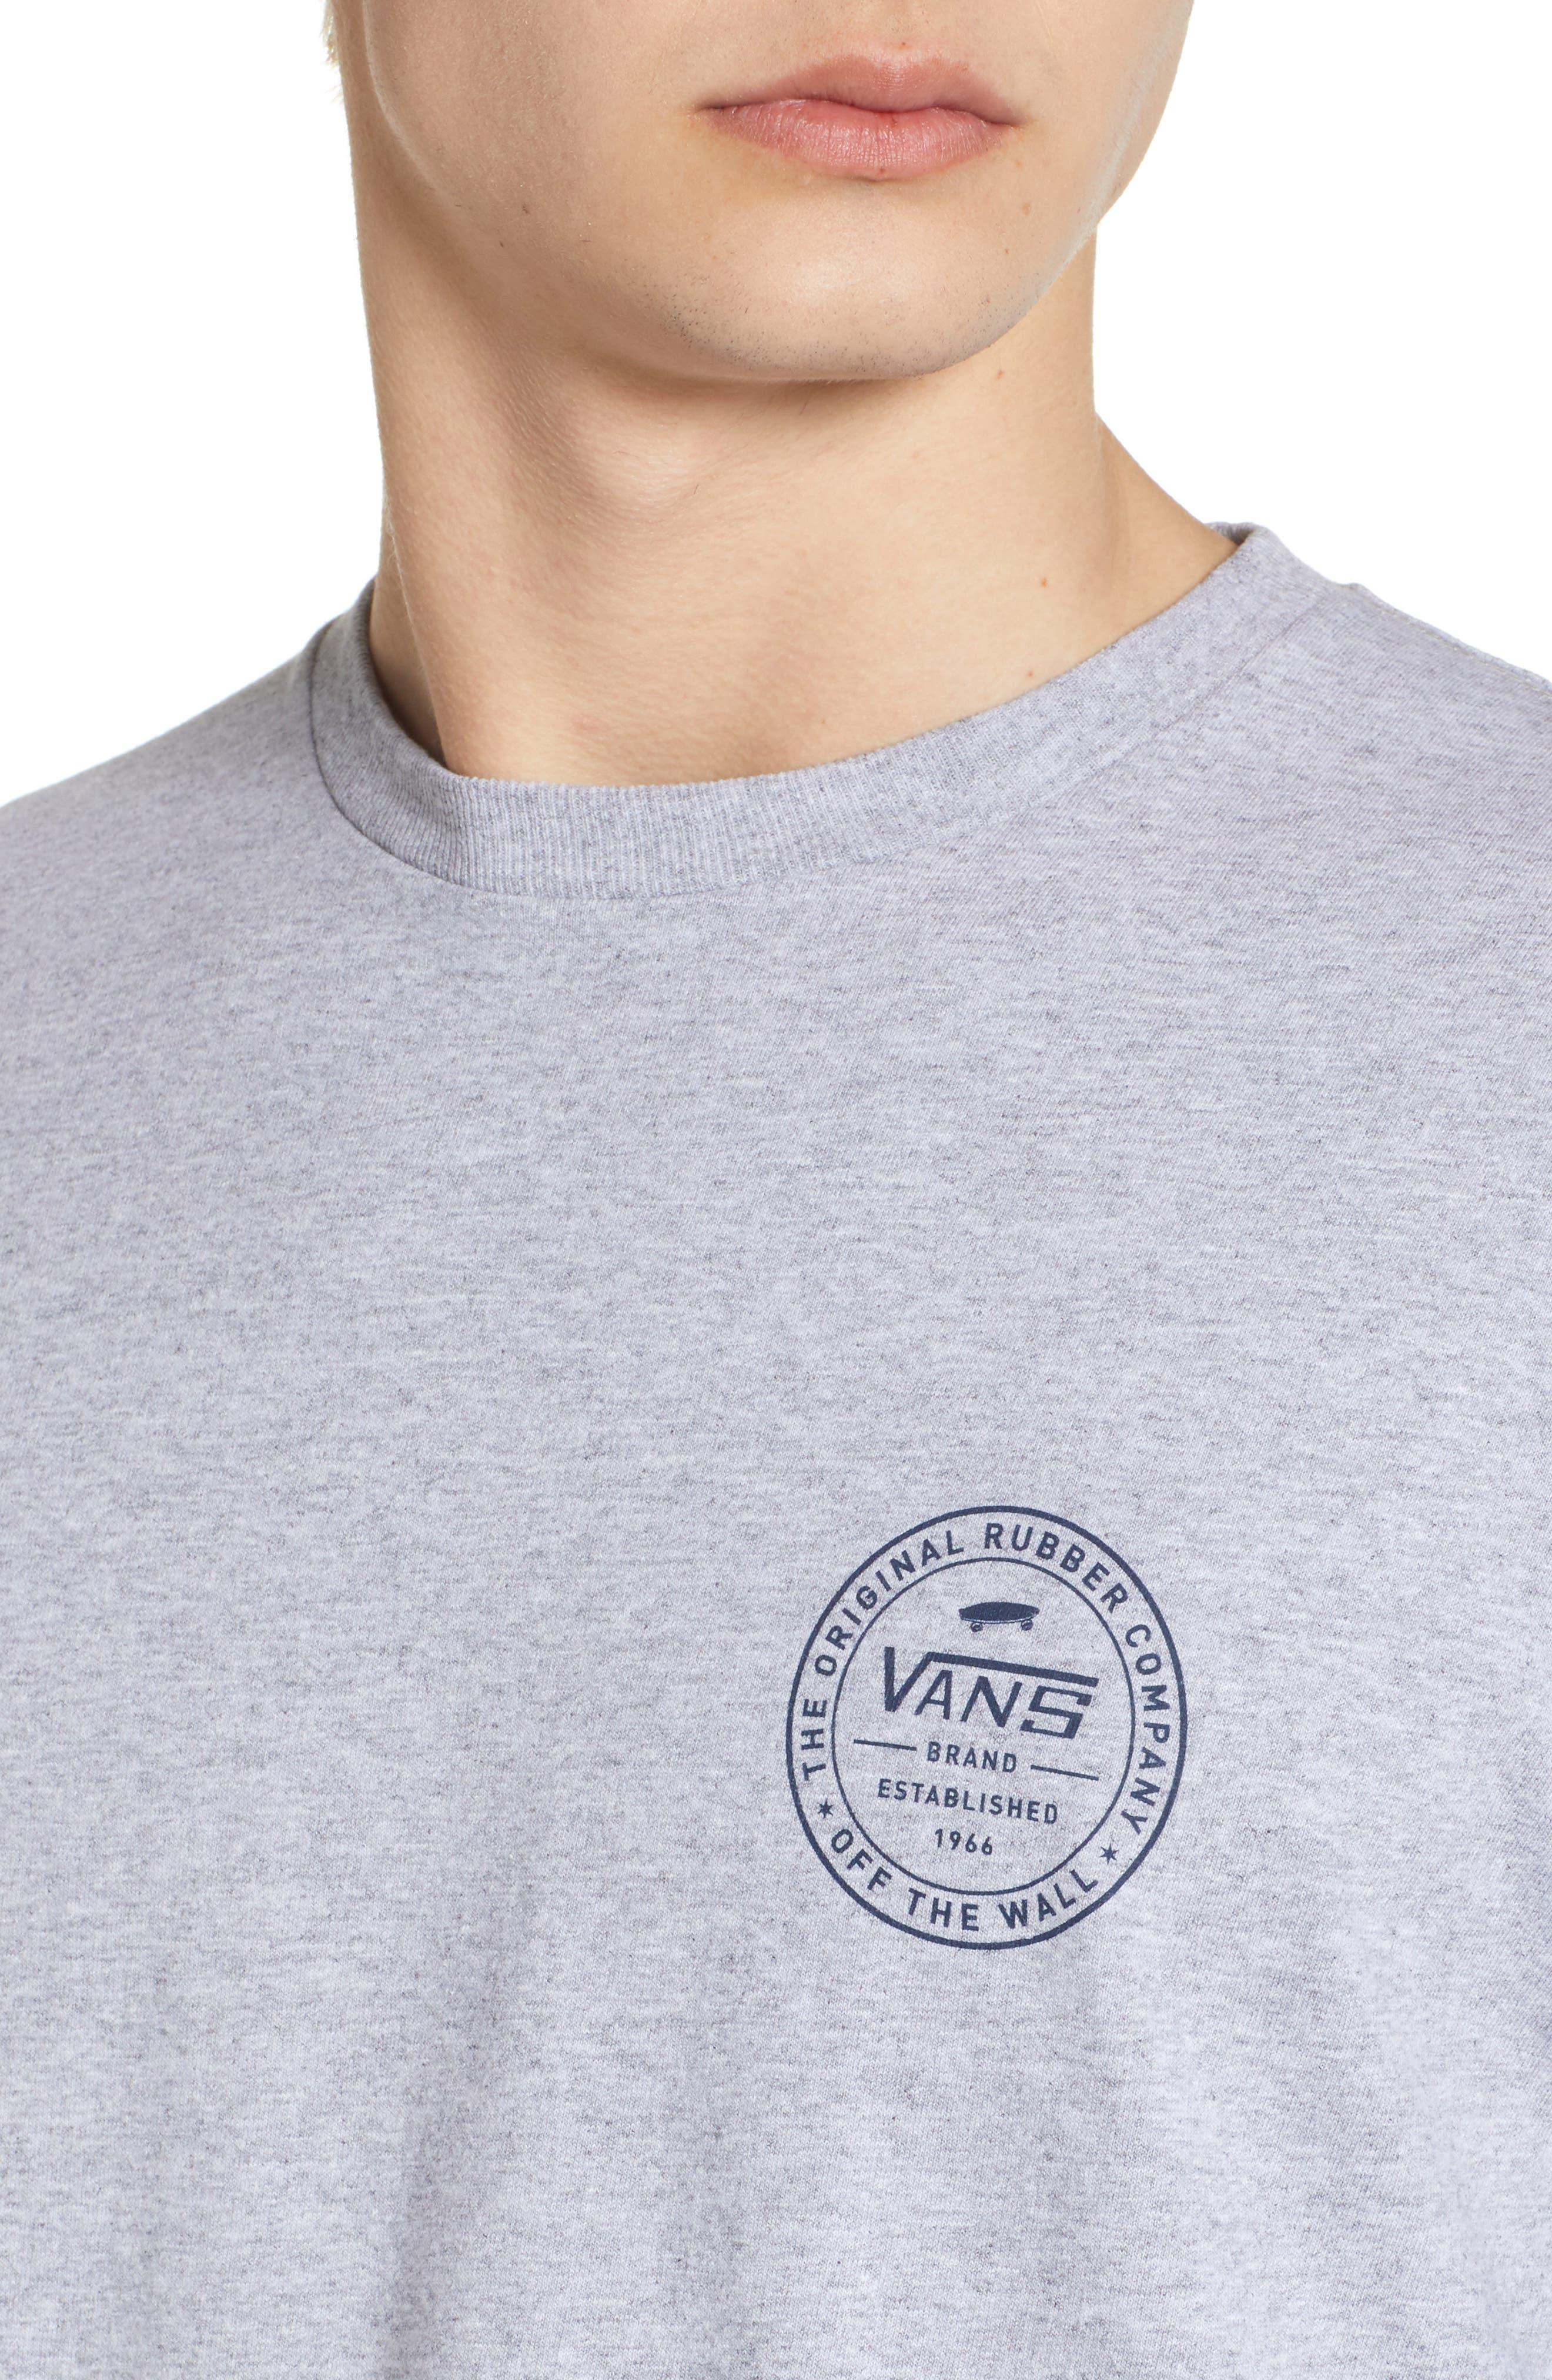 Established '66 Graphic T-Shirt,                             Alternate thumbnail 4, color,                             Grey